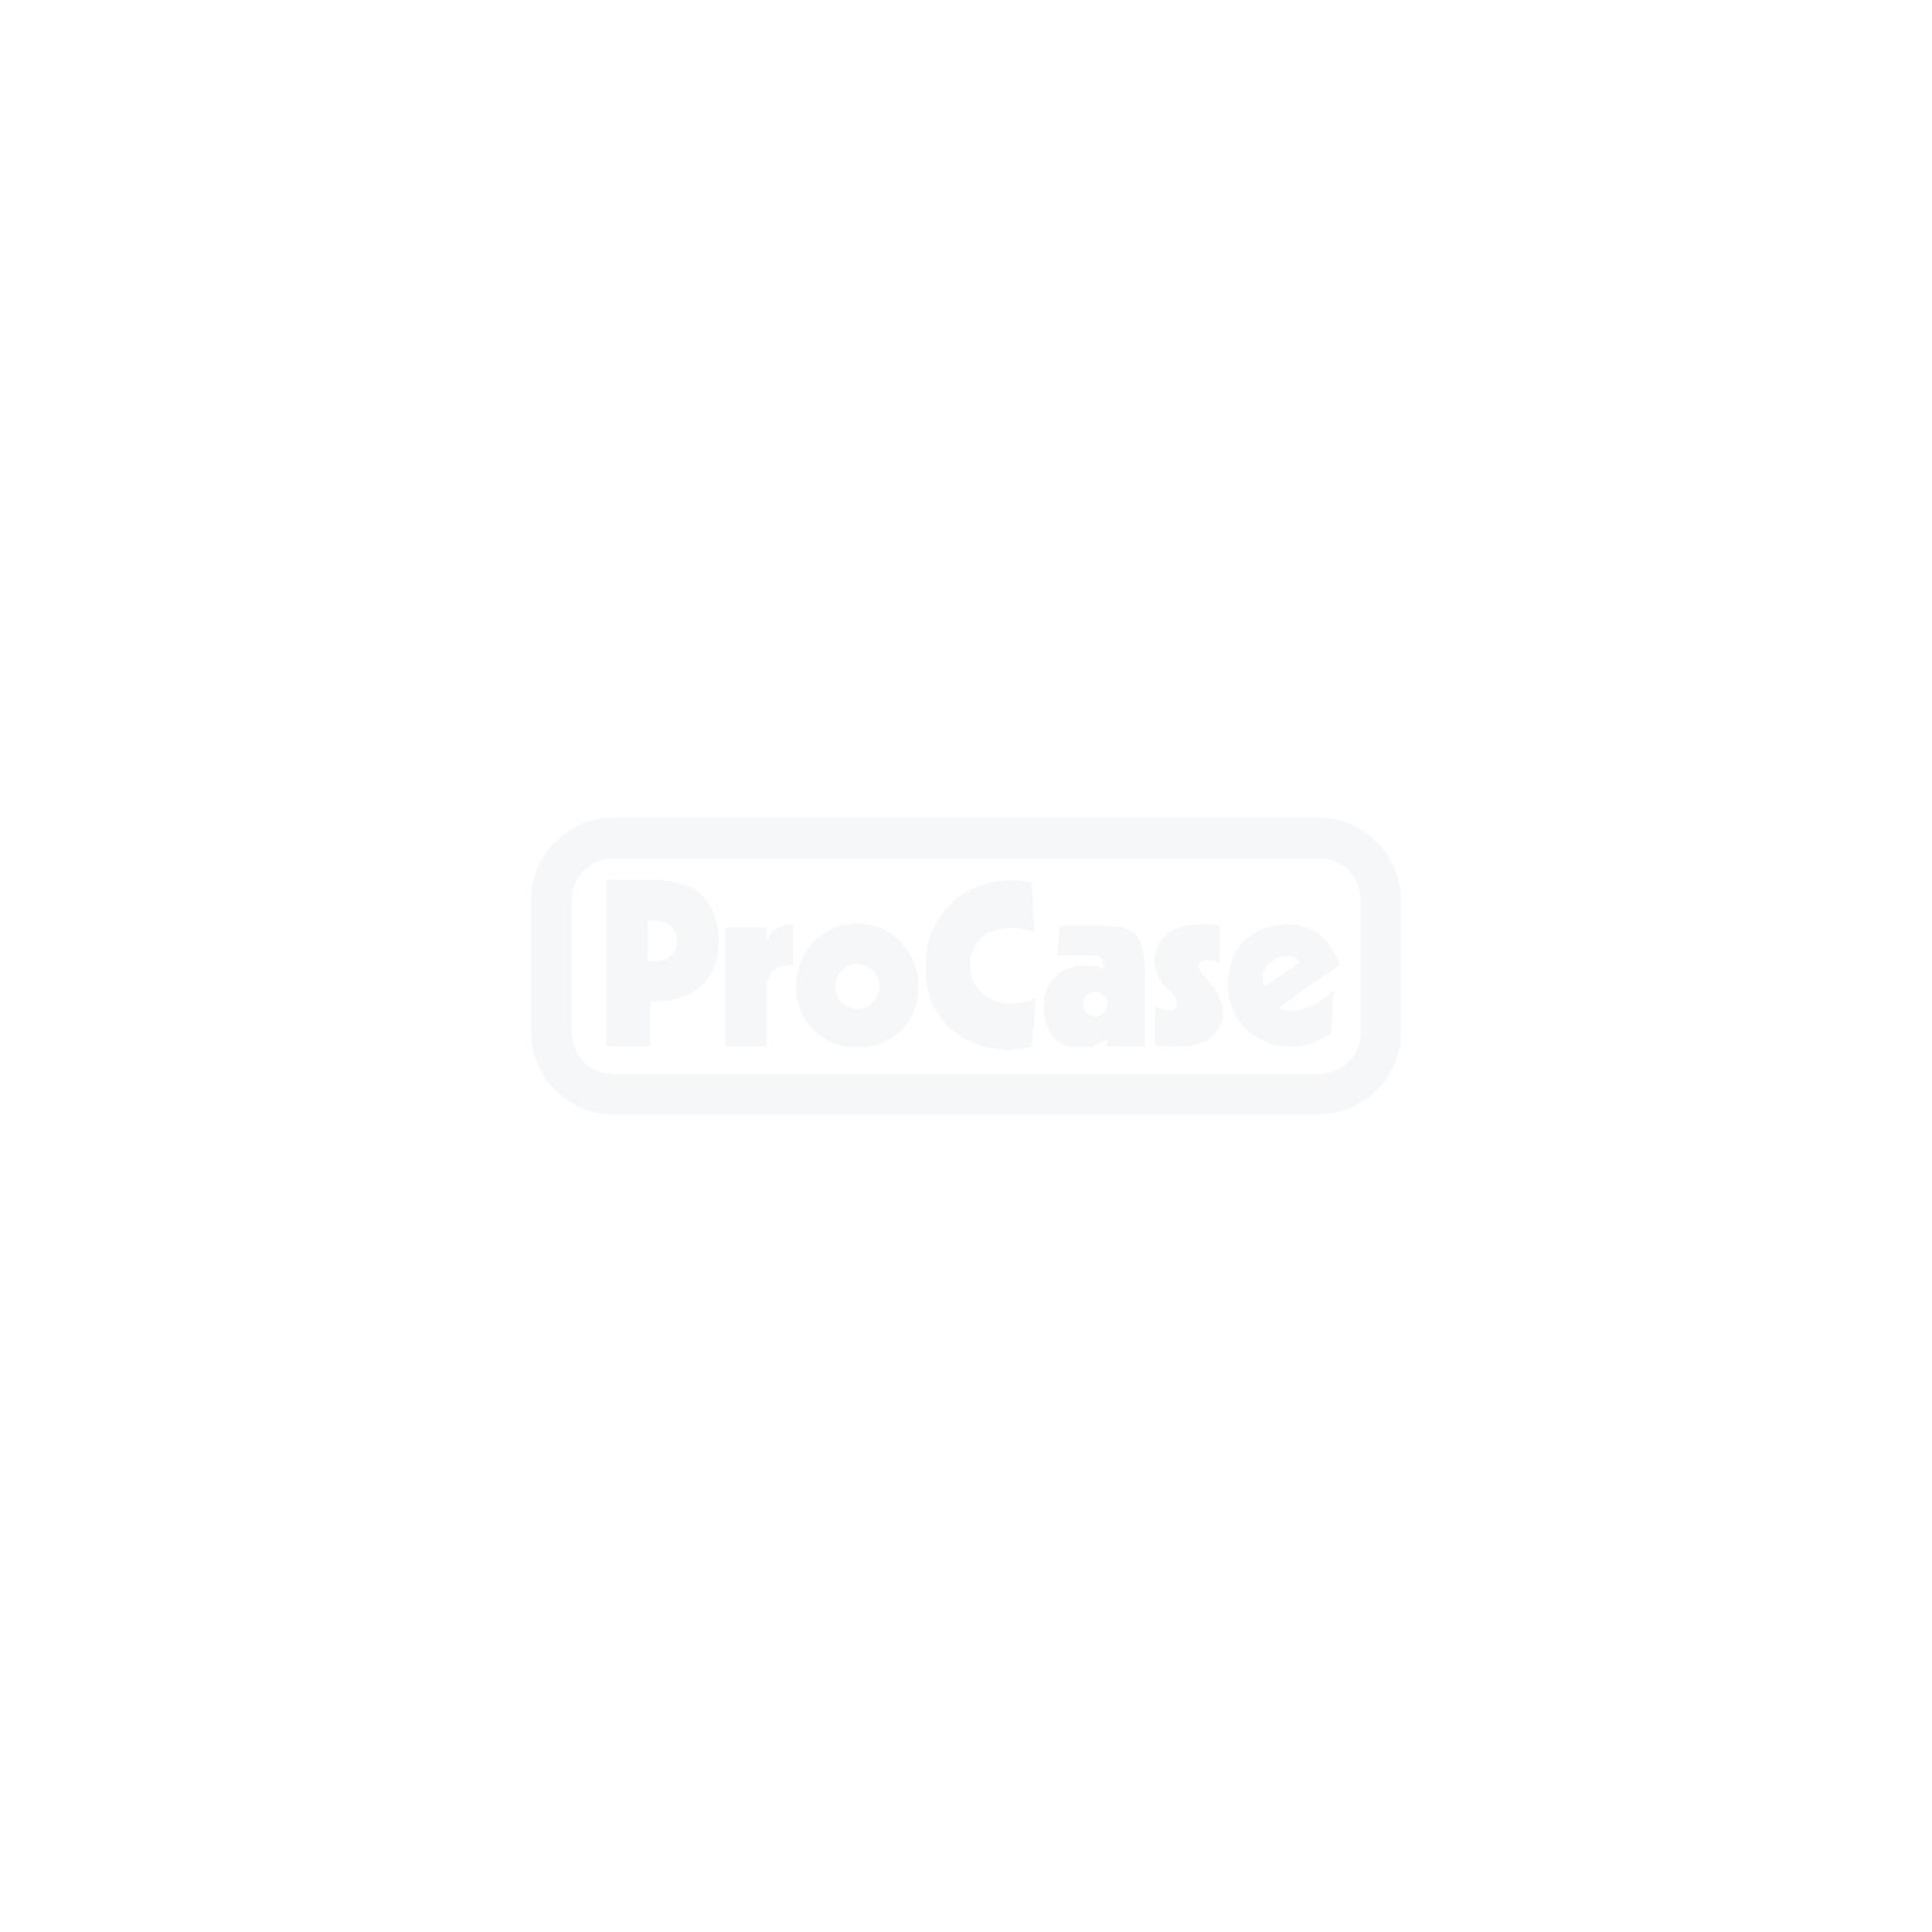 SKB 3i Koffer 3021-18B mit Rasterschaumstoff 2